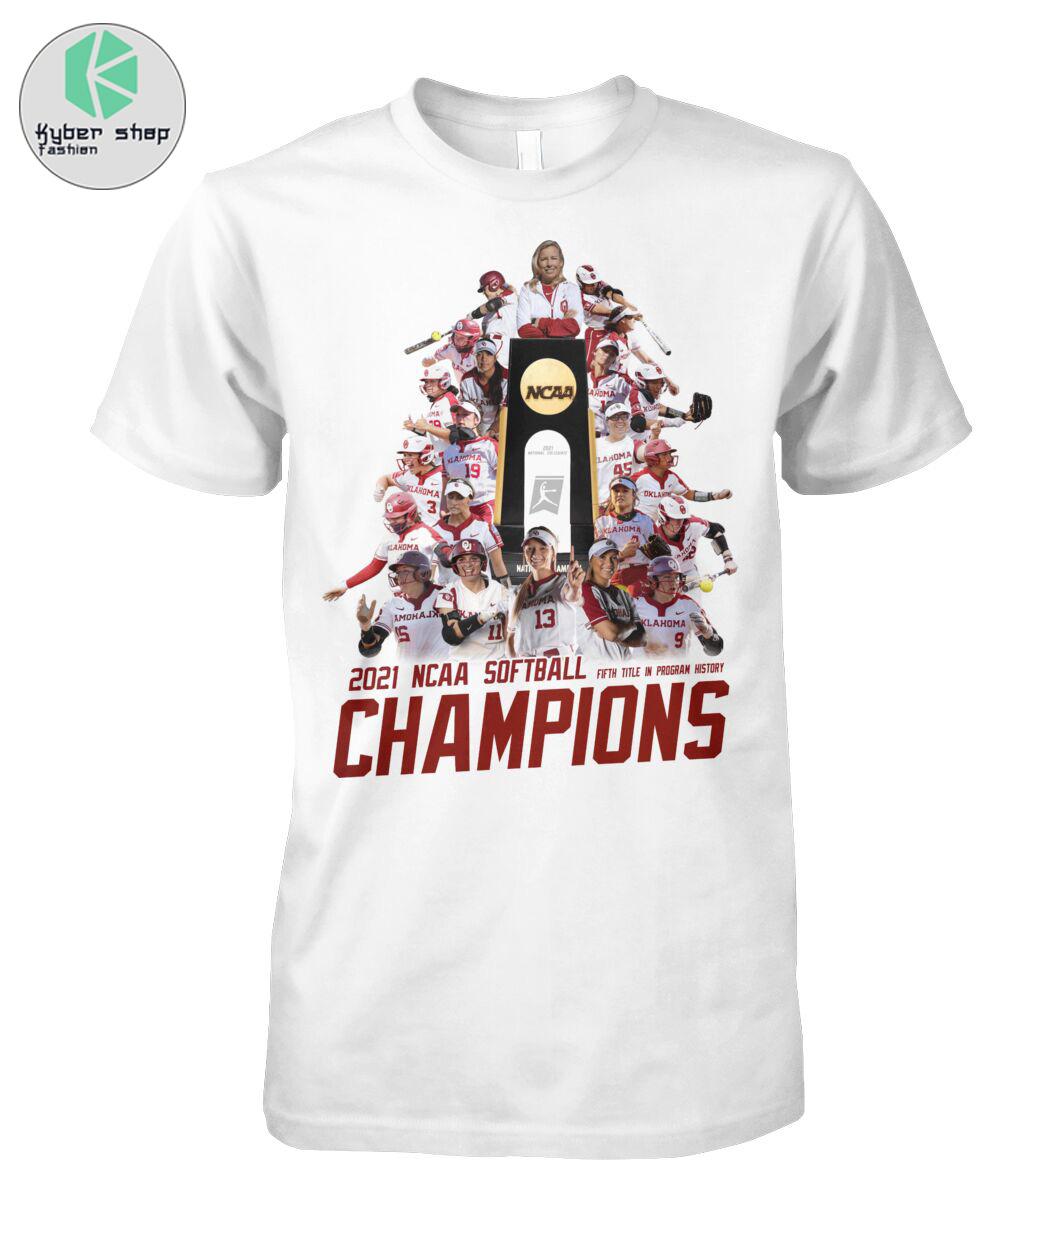 Oklahoma Sooners 2021 NCAA softball champions shirt 2